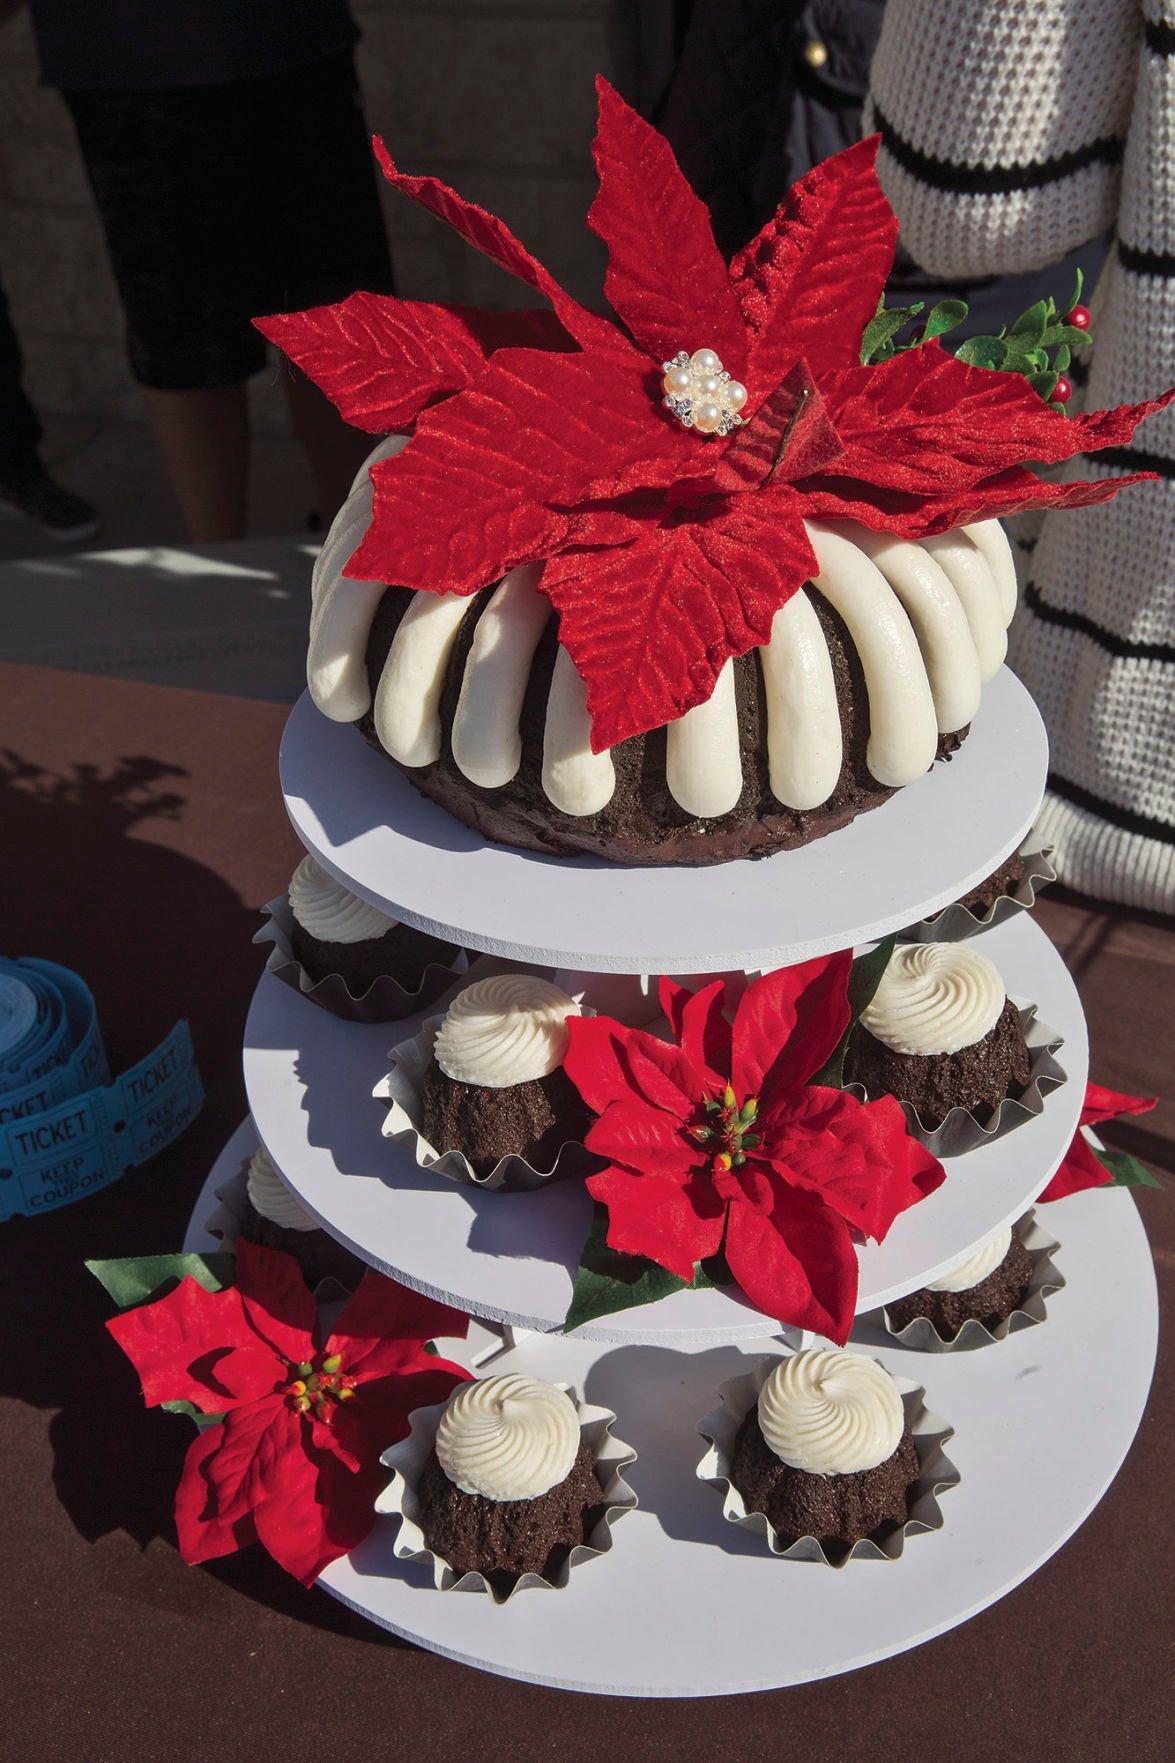 20191207_Nothing Bundt Cakes_0017c.jpg